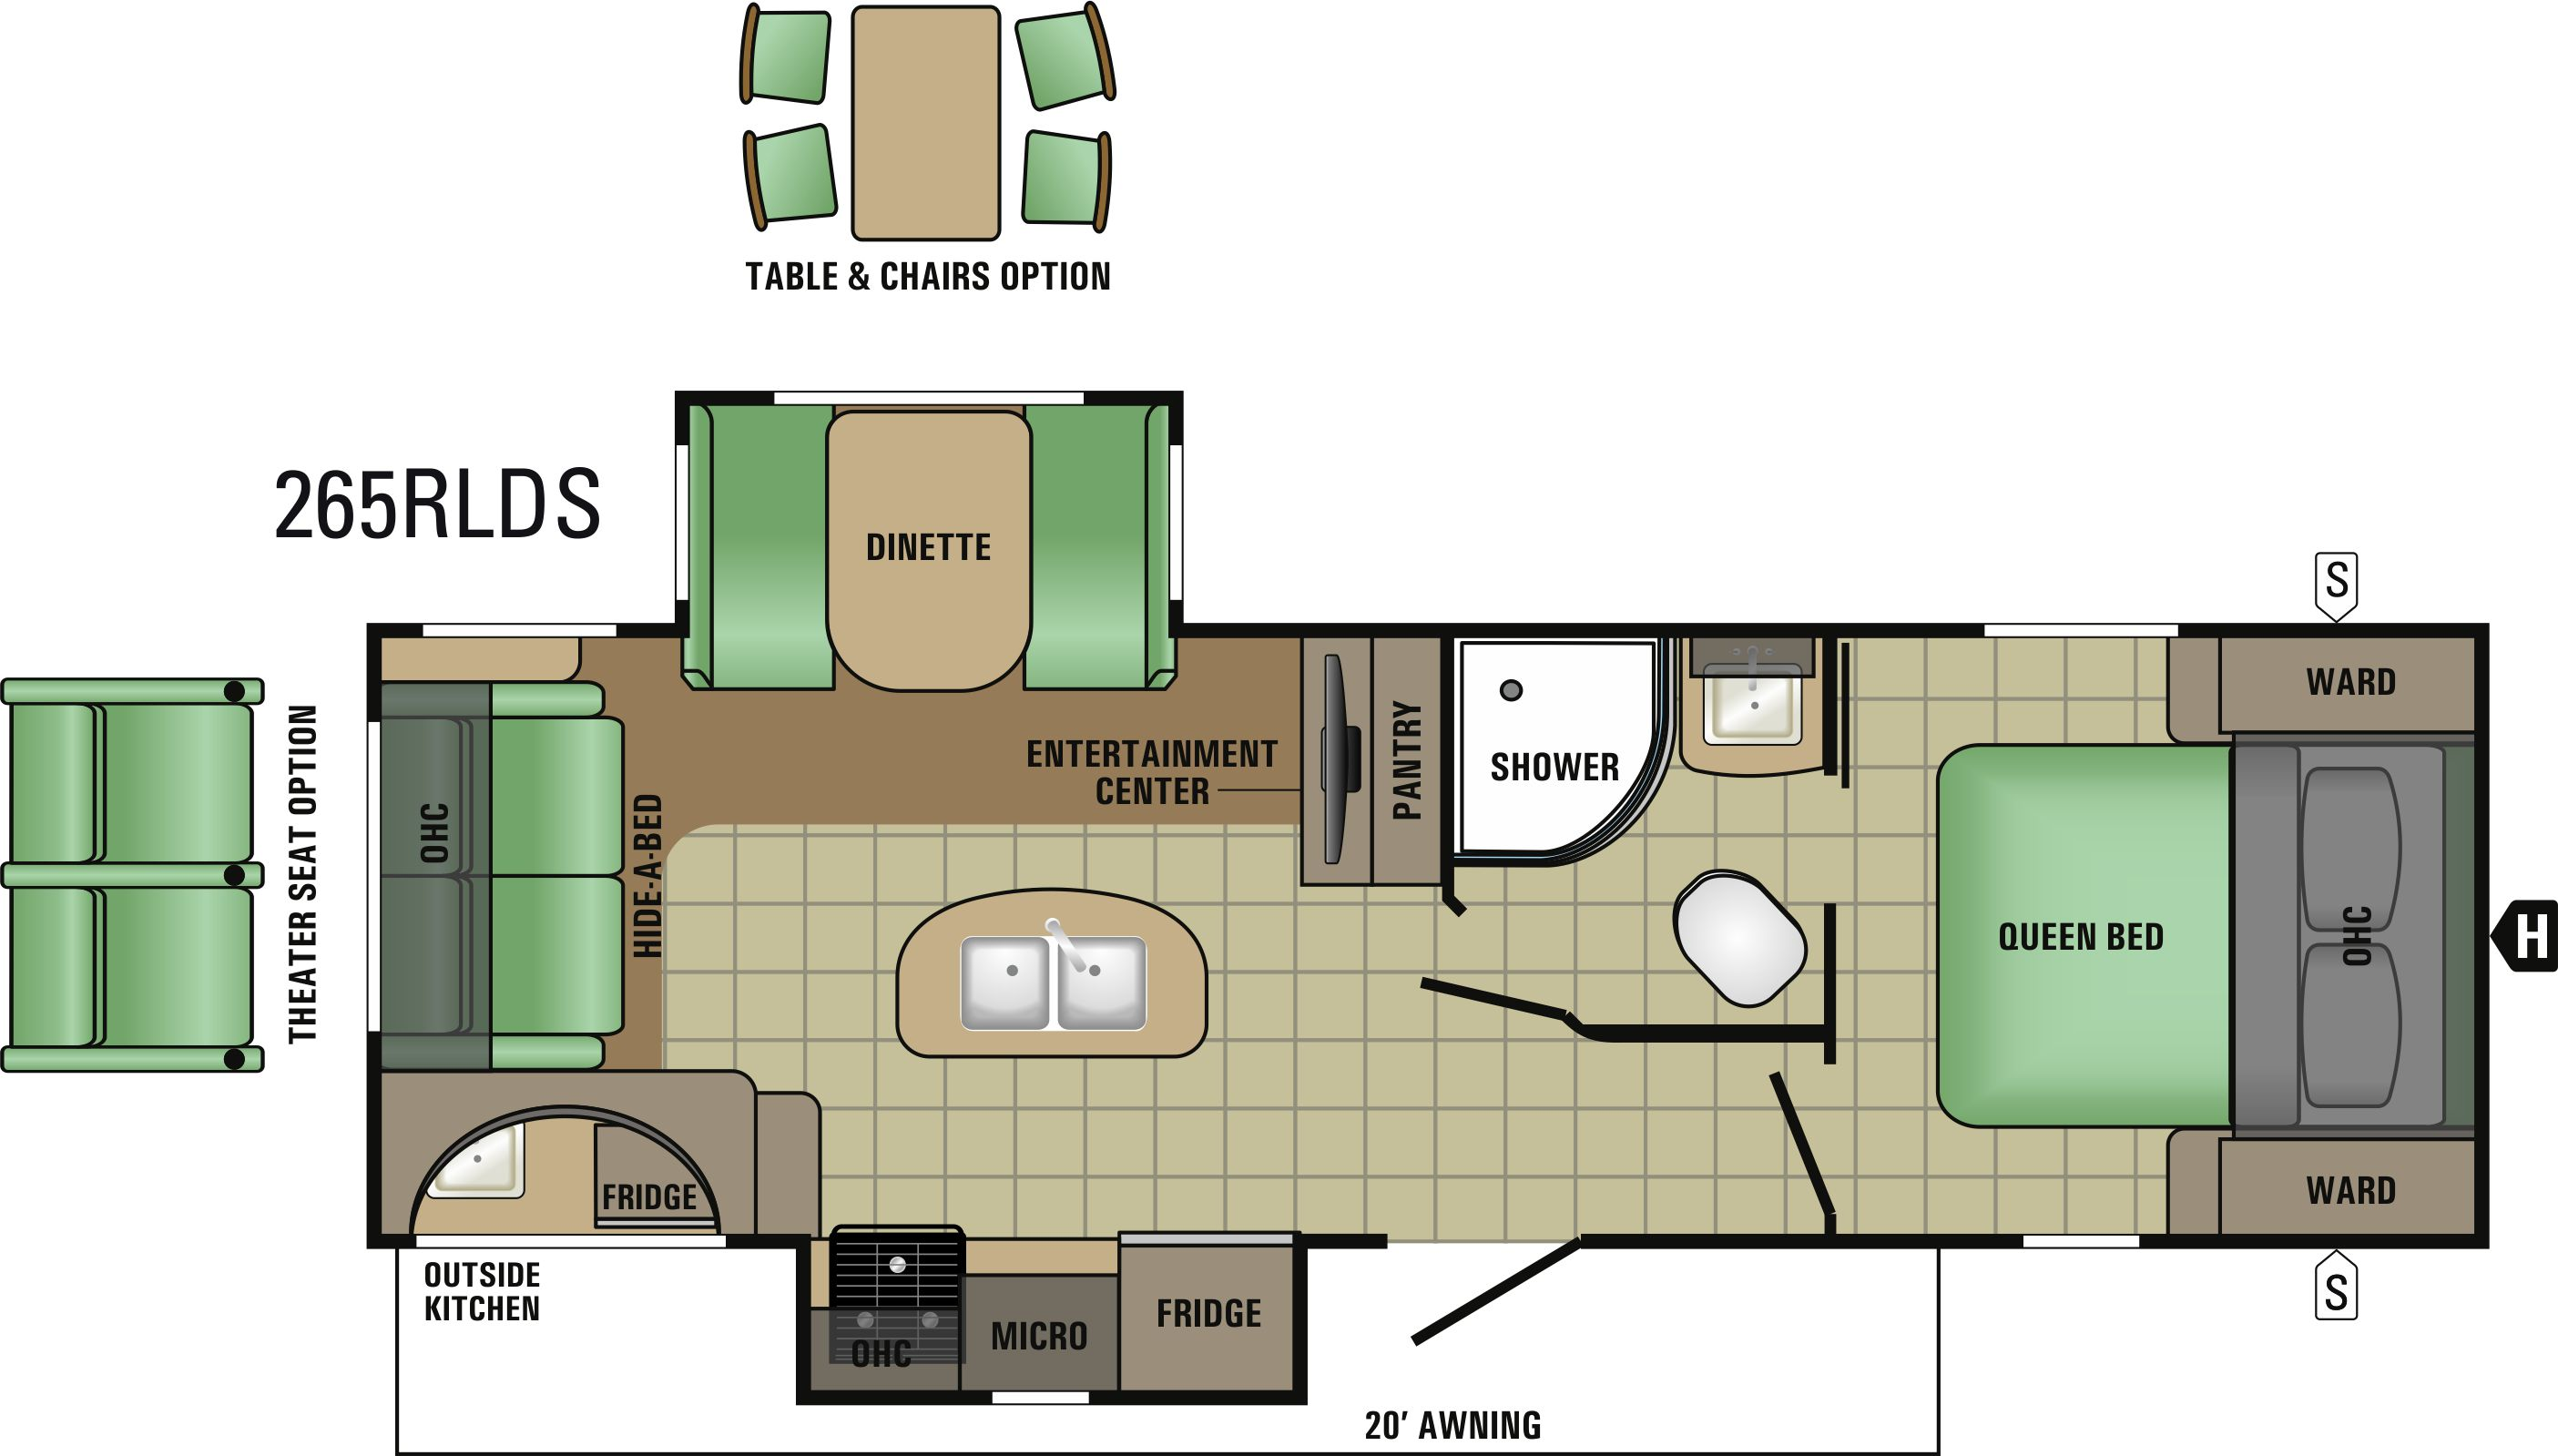 265RLDS Floorplan